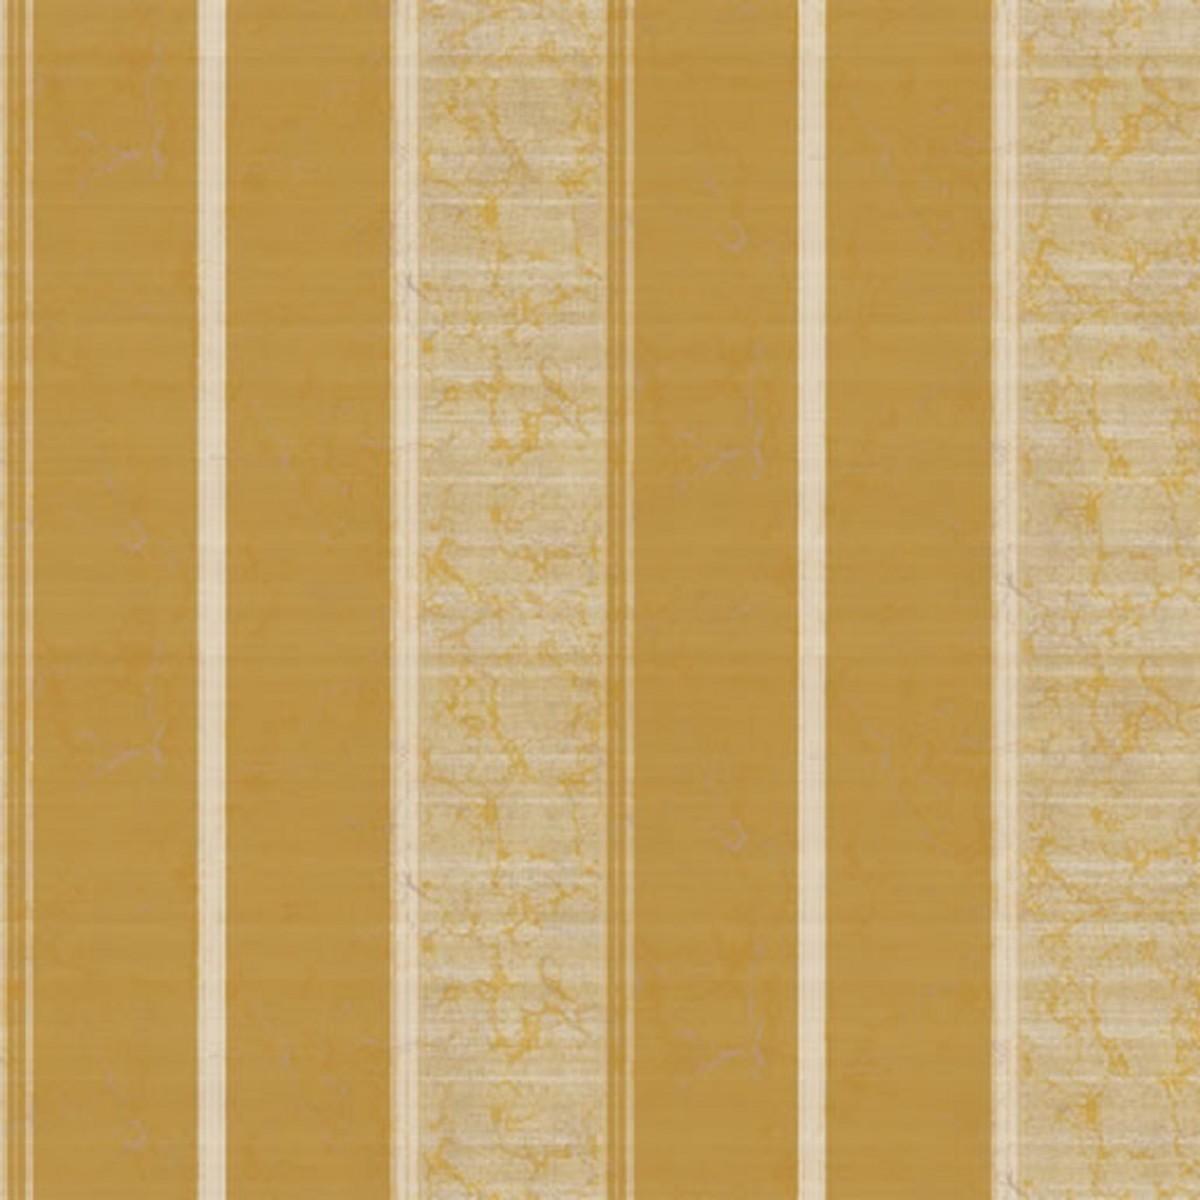 Виниловые обои York Wallcoverings серые BW8137 0.68 м